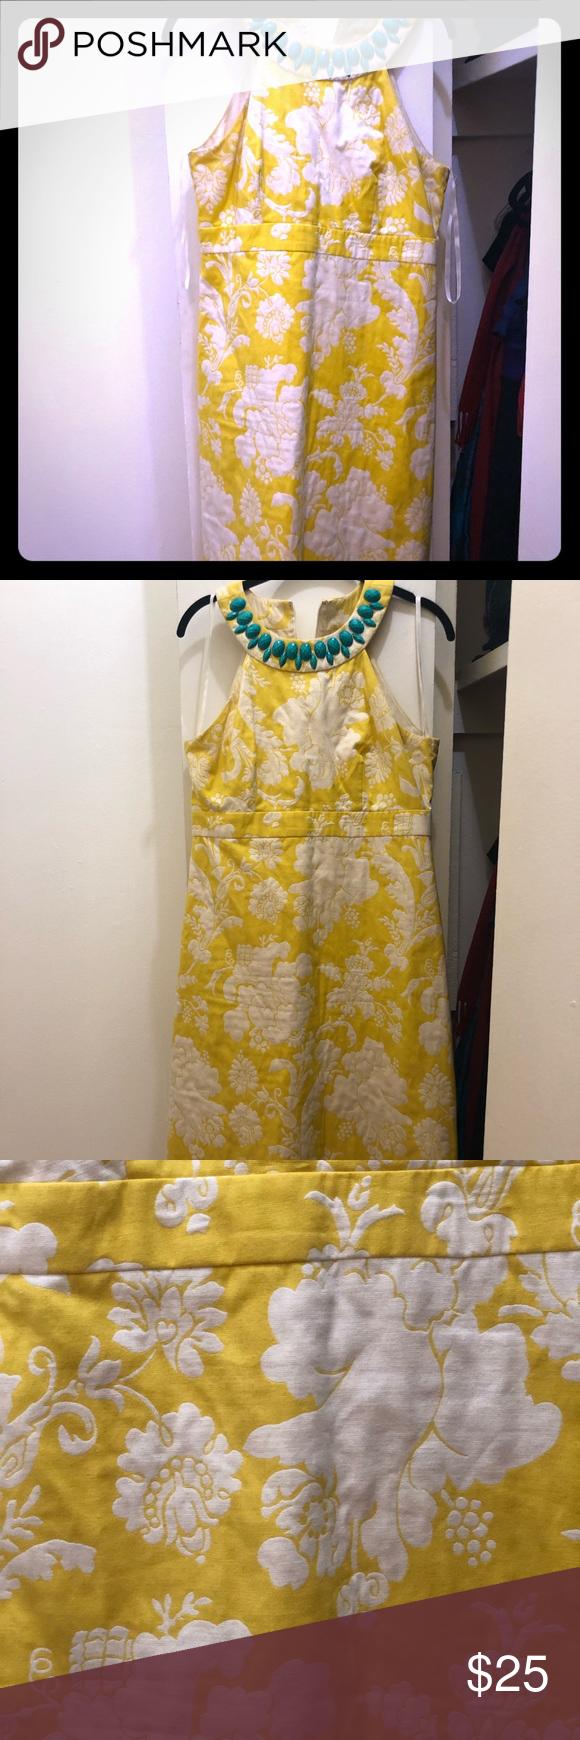 Yellow White Brocade Mid Length Dress By Eliza J Yellow And White Dress Yellow White Mid Length Dresses [ 1740 x 580 Pixel ]